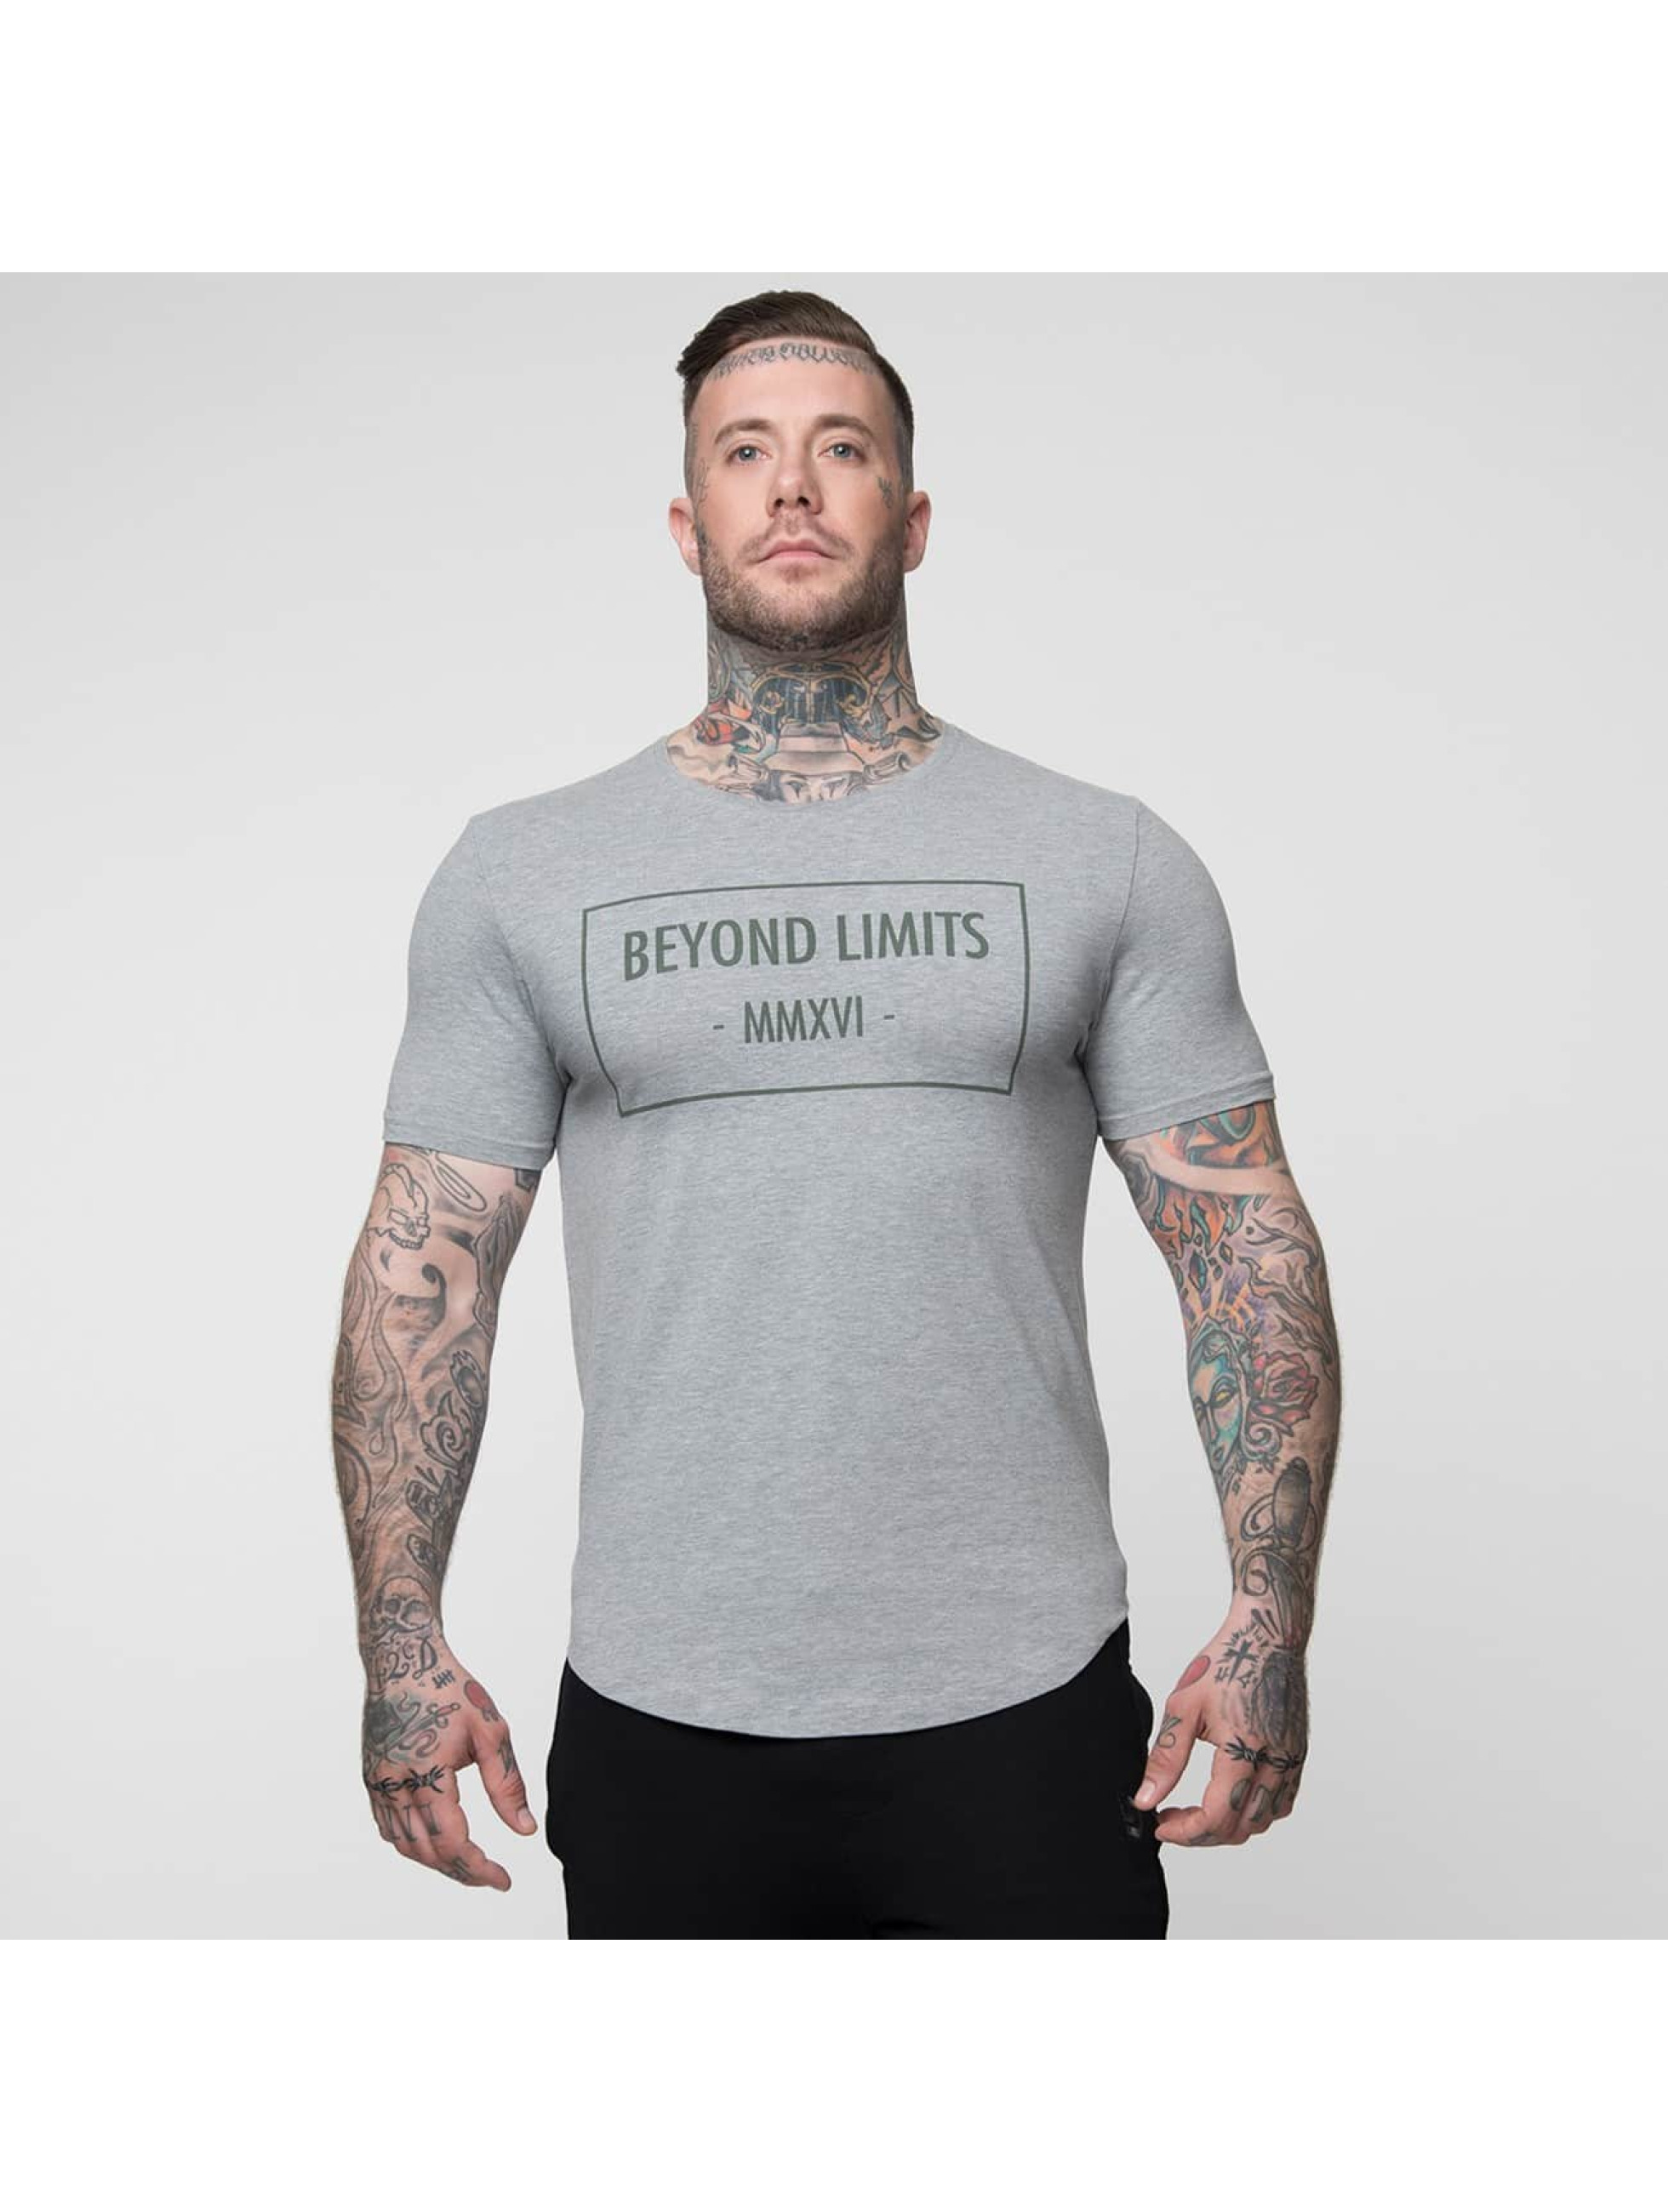 Beyond Limits T-Shirt Signature gray